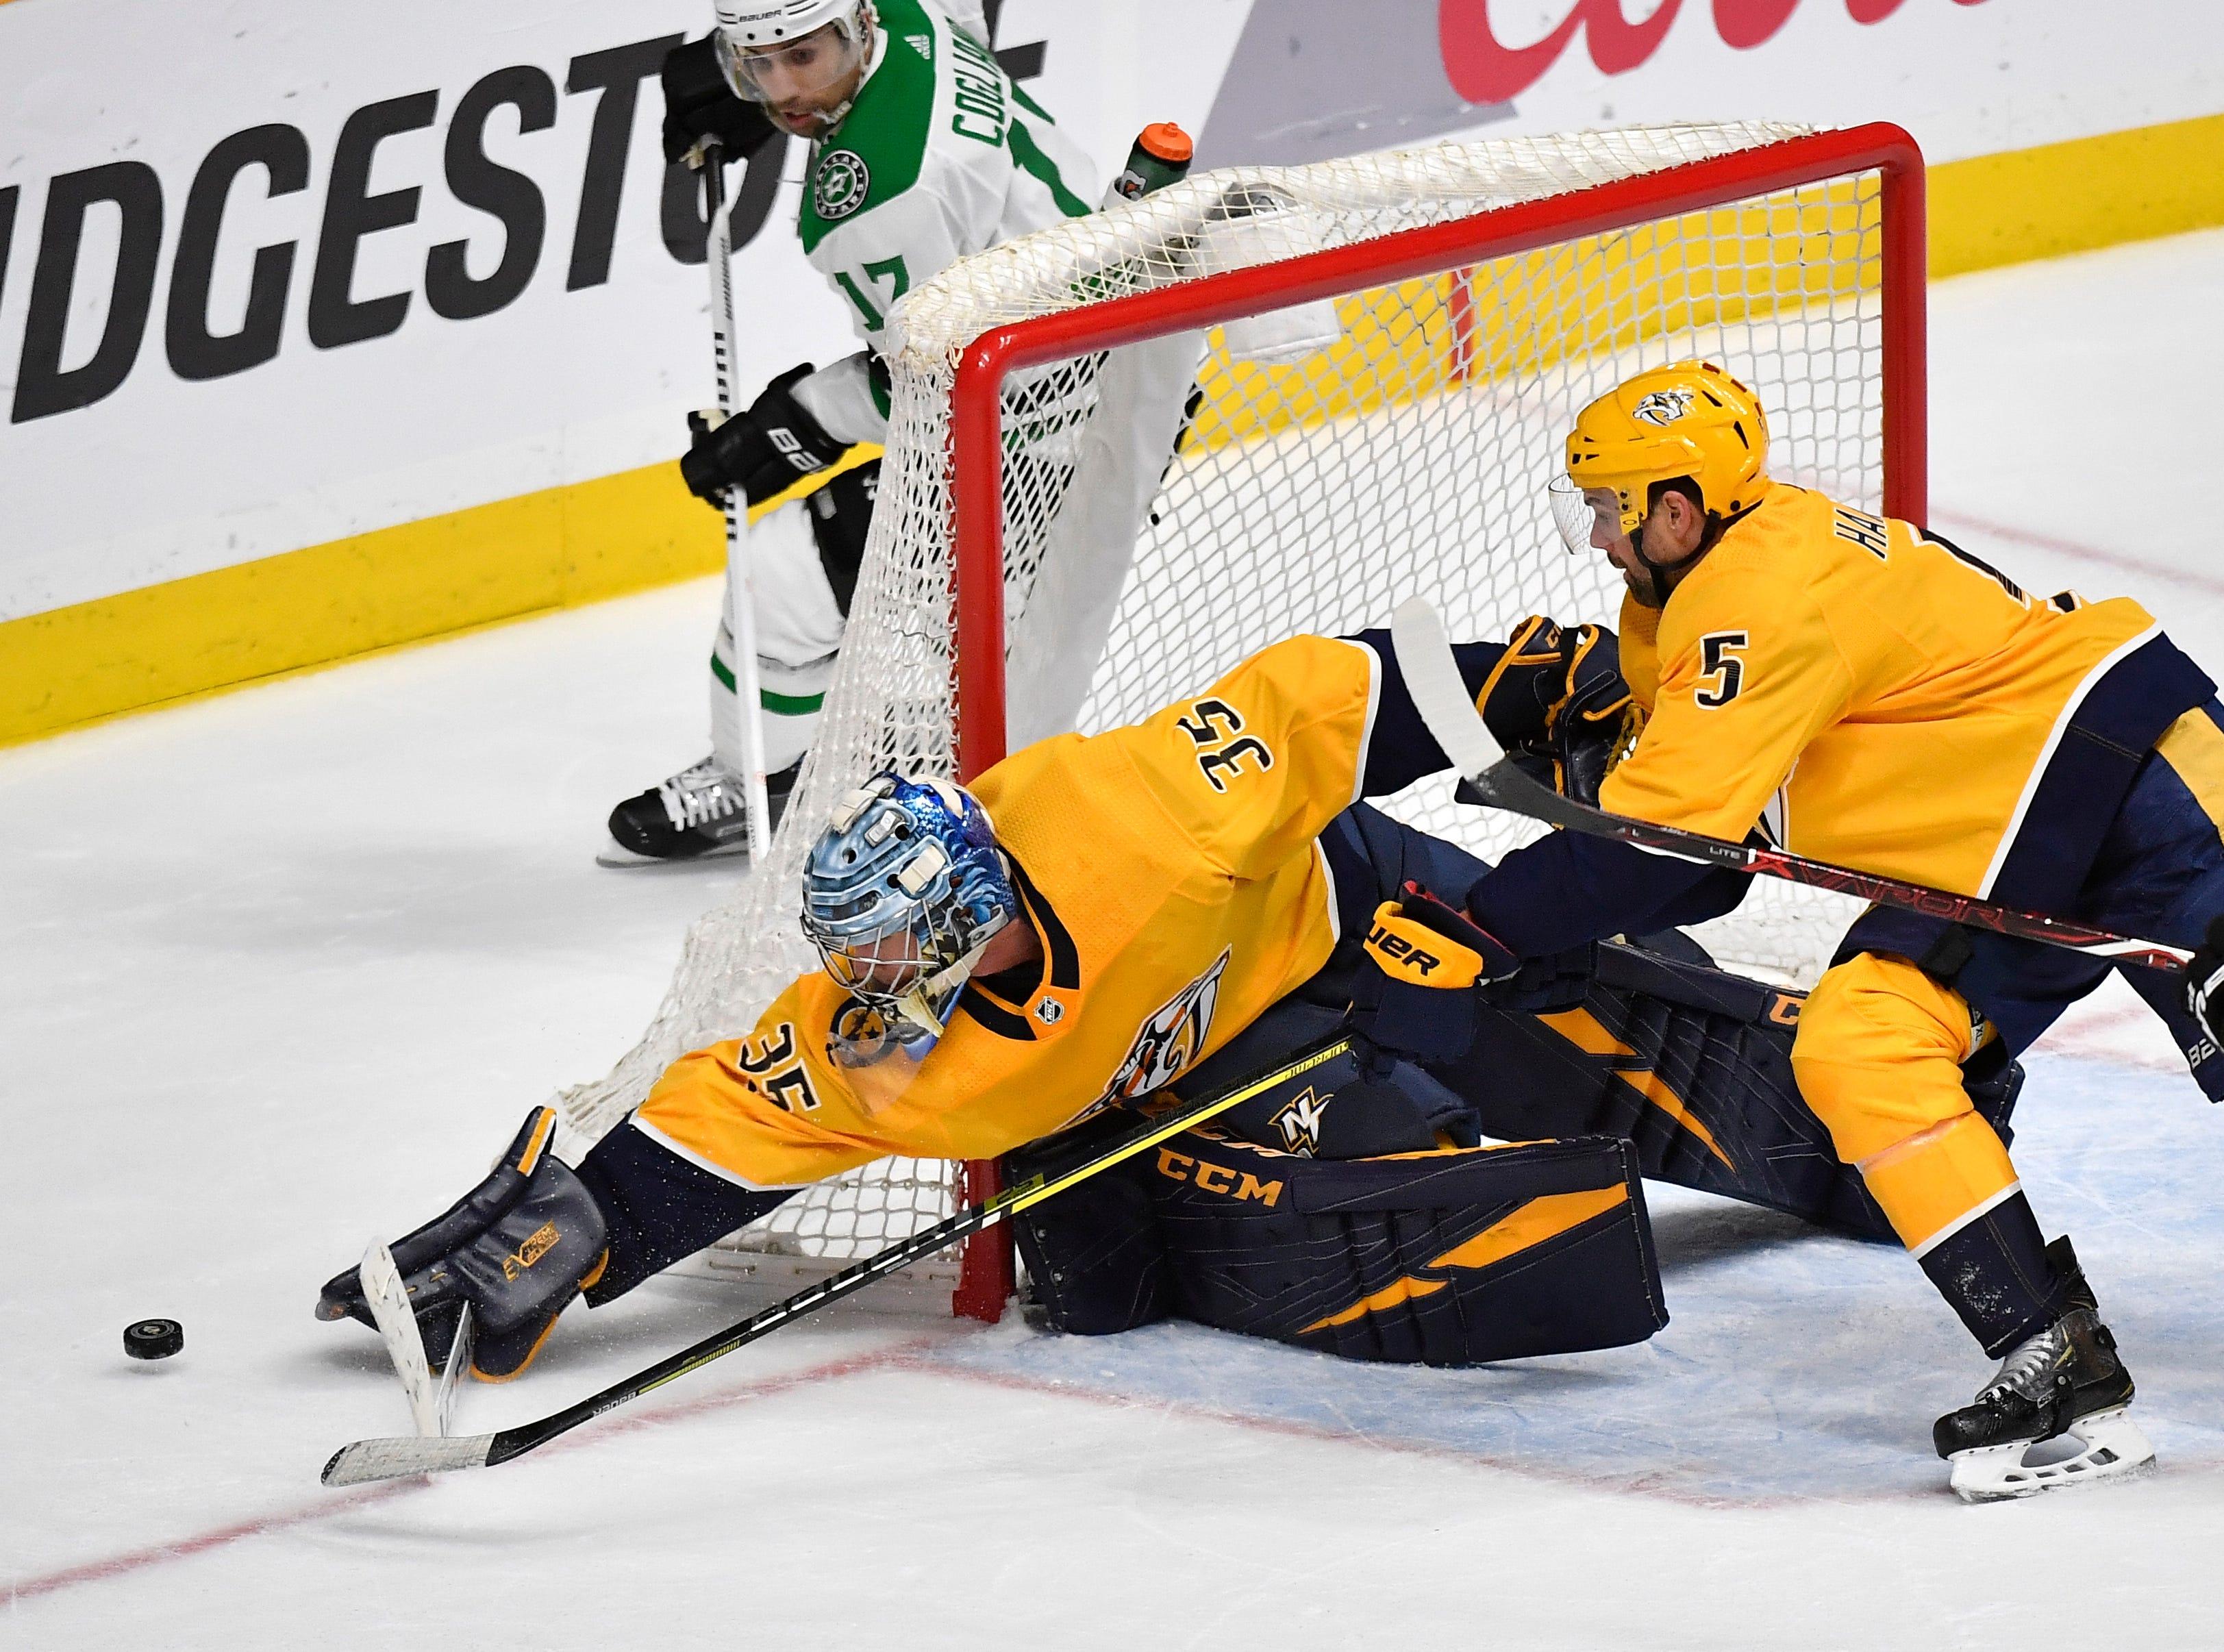 Nashville Predators goaltender Pekka Rinne (35) plays the puck wide during the first period of the divisional semifinal game at Bridgestone Arena in Nashville, Tenn., Saturday, April 13, 2019.